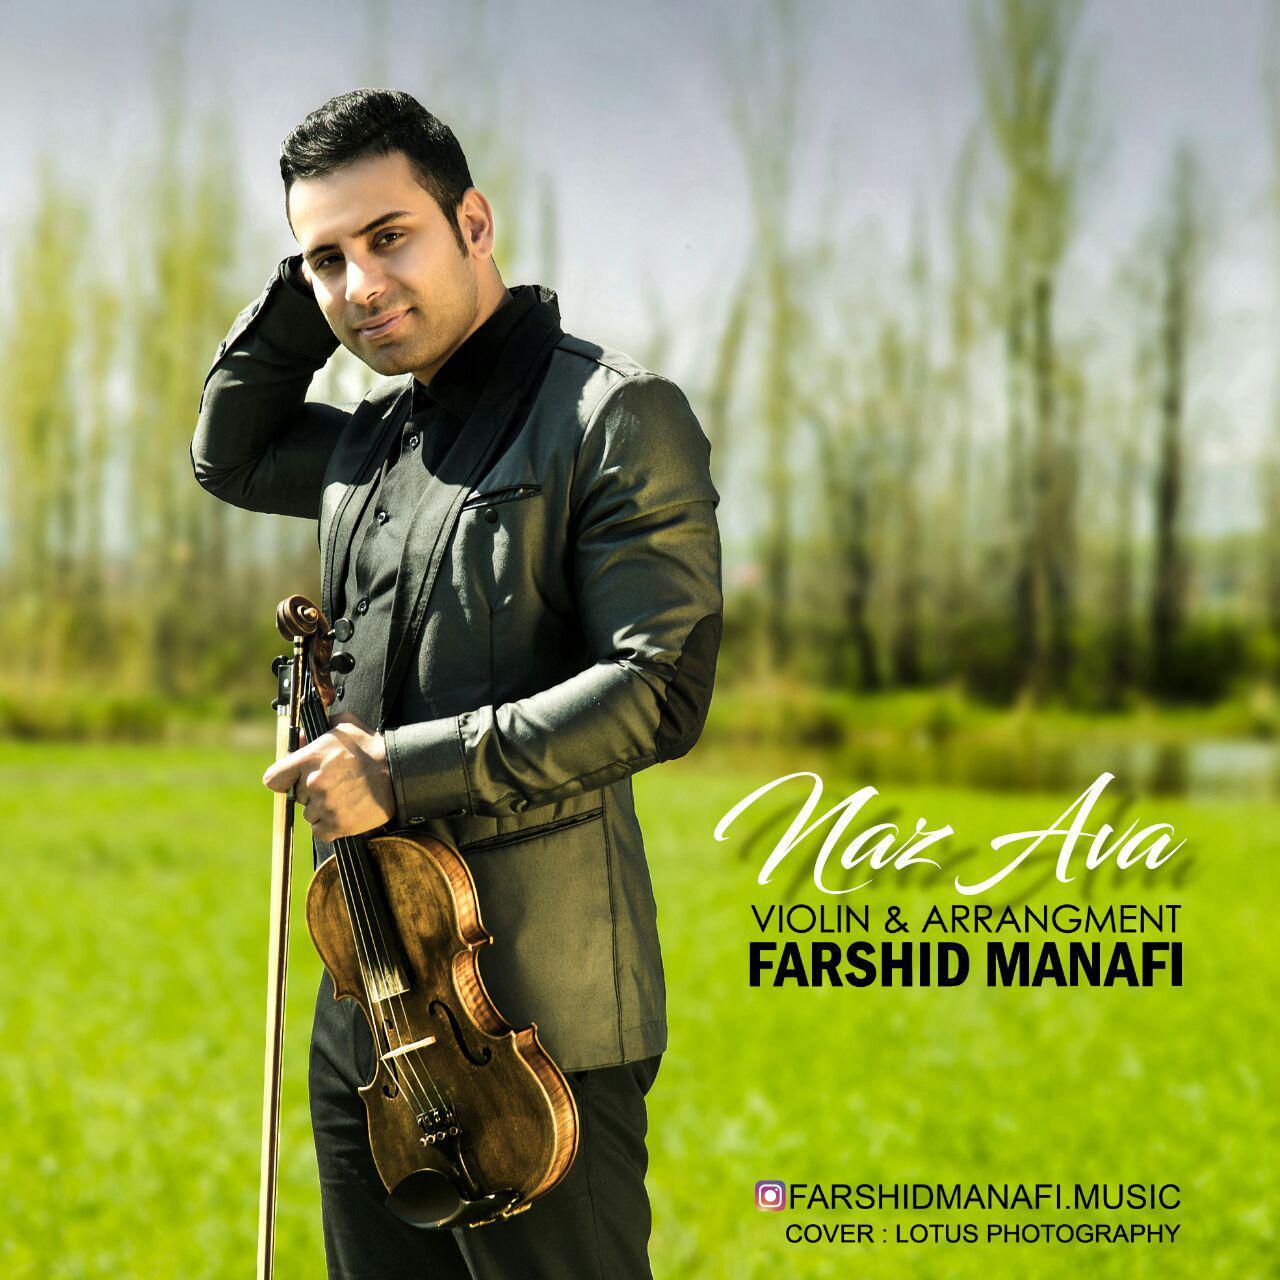 http://s9.picofile.com/file/8356465026/06Farshid_Manafi_Naz_Ava.jpg